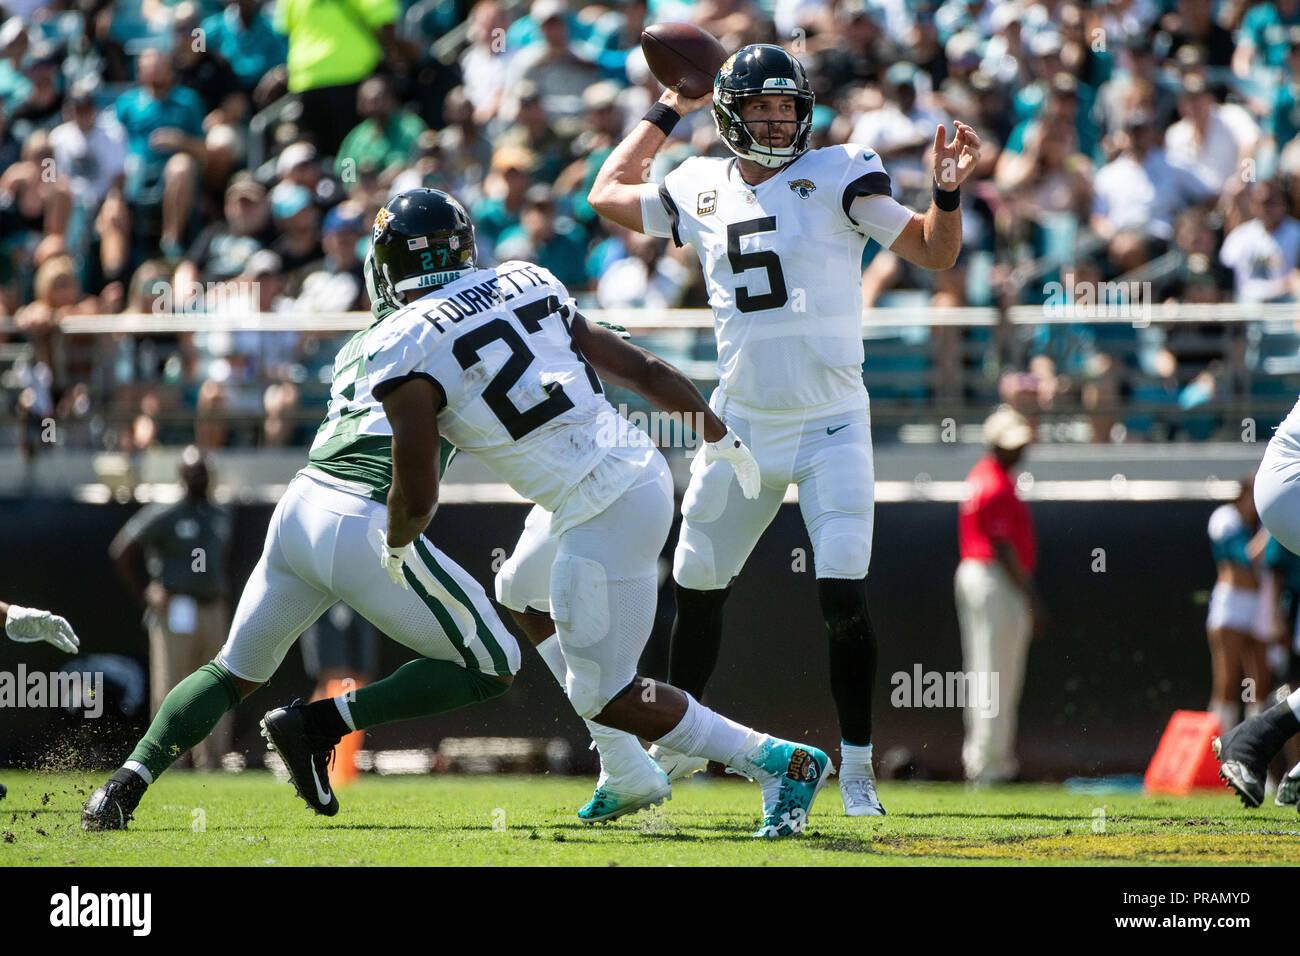 Jacksonville, FL, USA. 30th Sep, 2018. Jacksonville Jaguars Quarterback  Blake Bortles (5) During 1st Half NFL Football Game Between The New York  Jets And ...